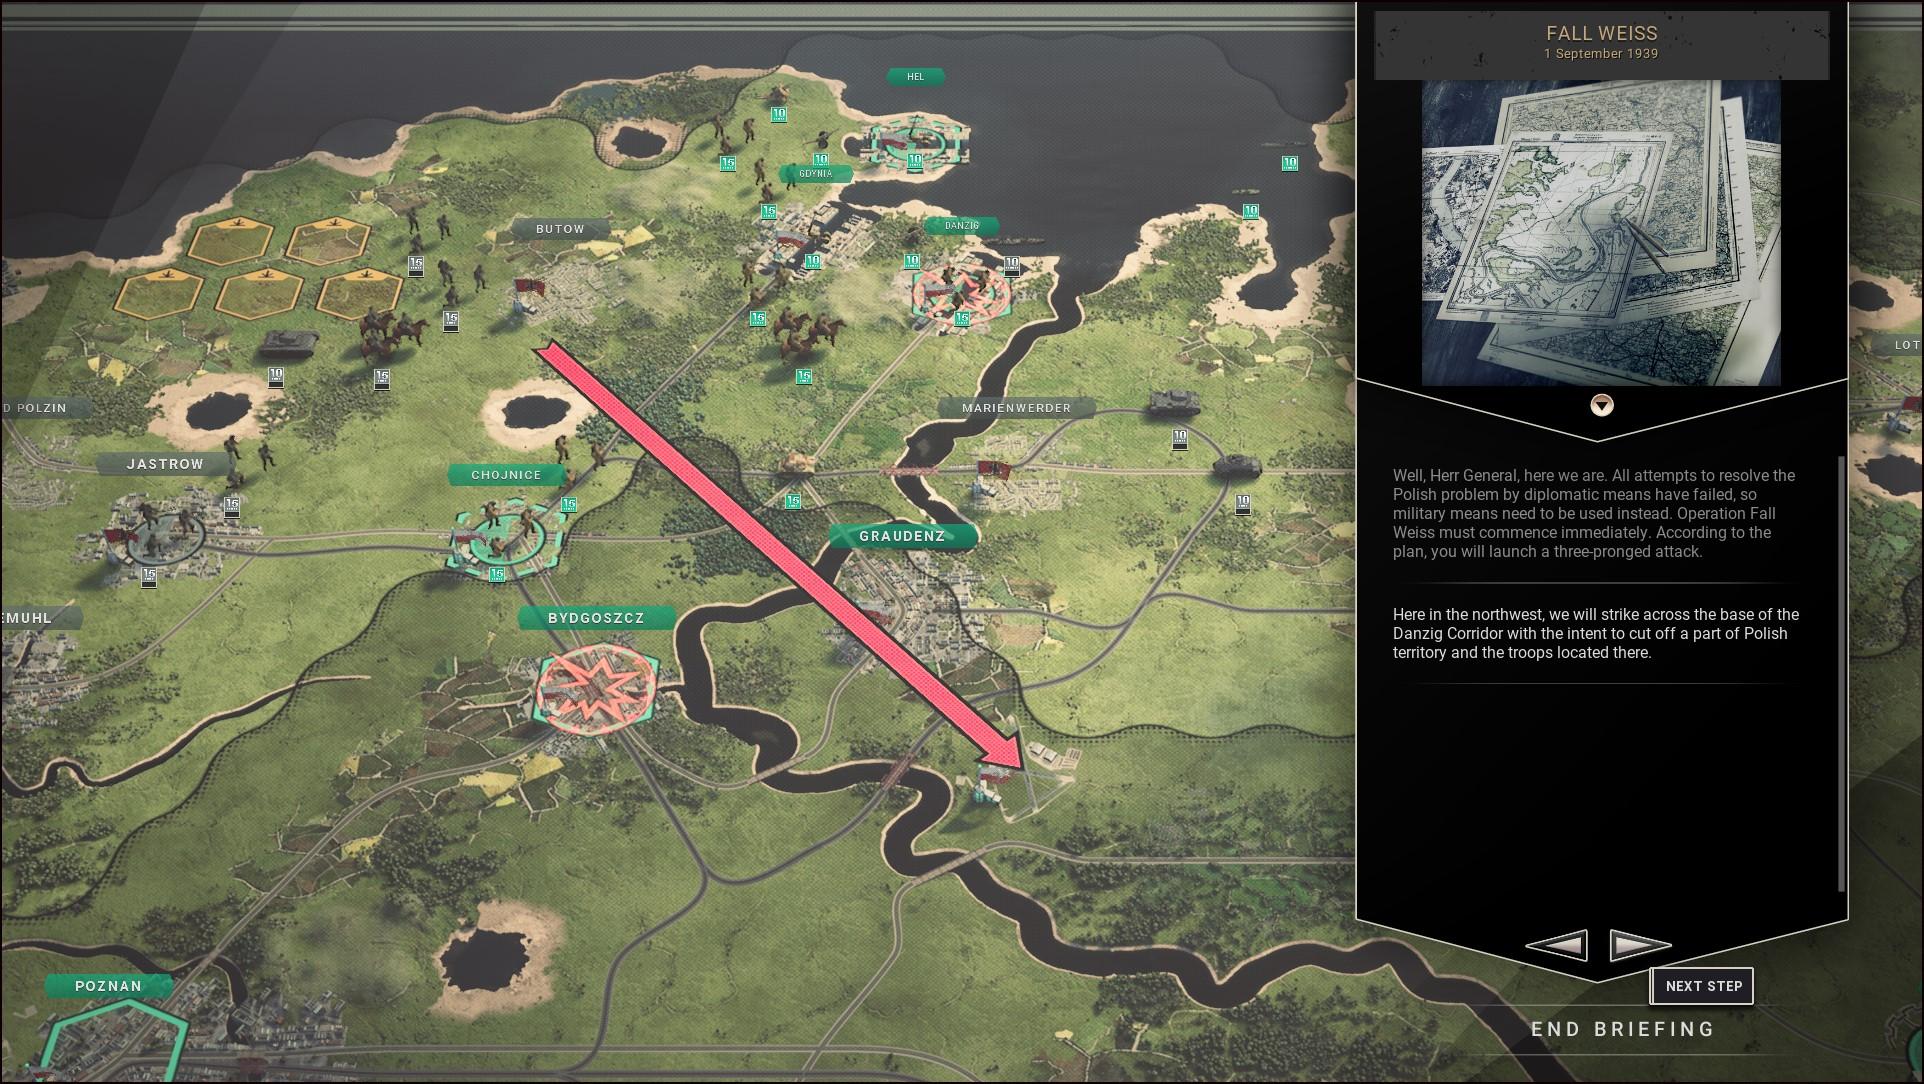 Best ww2 strategy games panzer corps 2 - WW2 games: the best World War II games